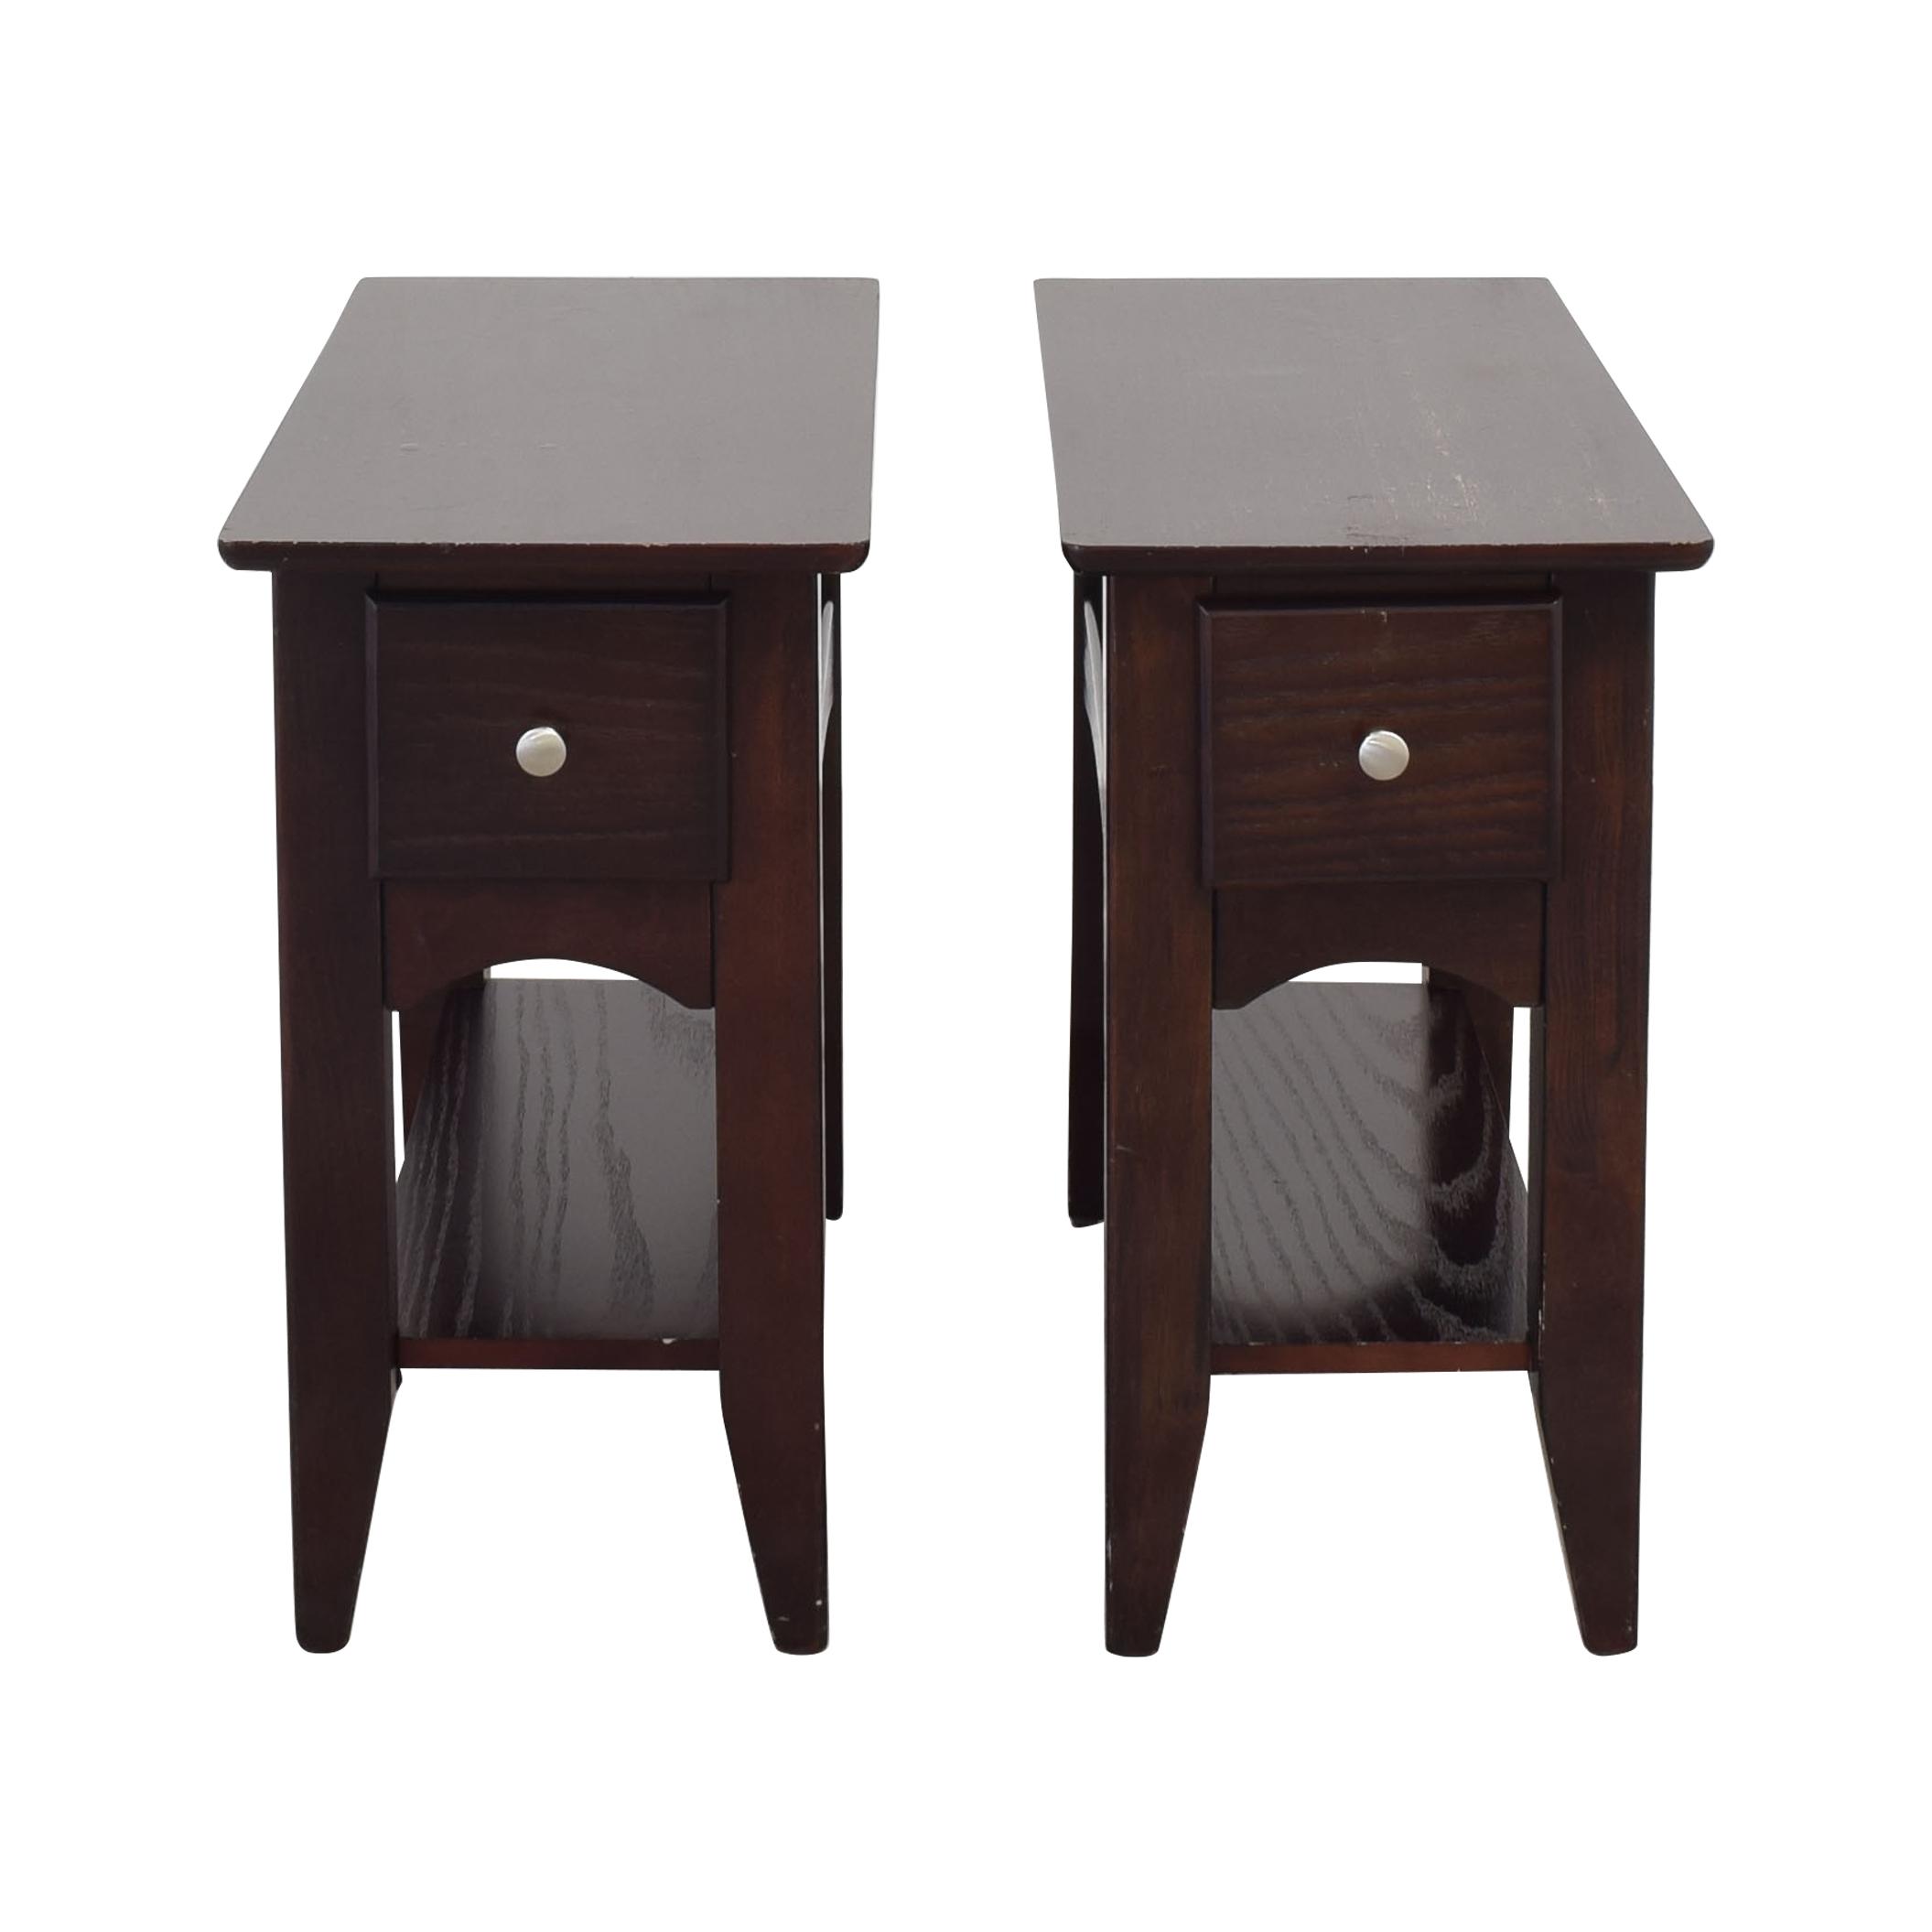 Riverside Furniture Riverside Furniture Metro II End Tables discount